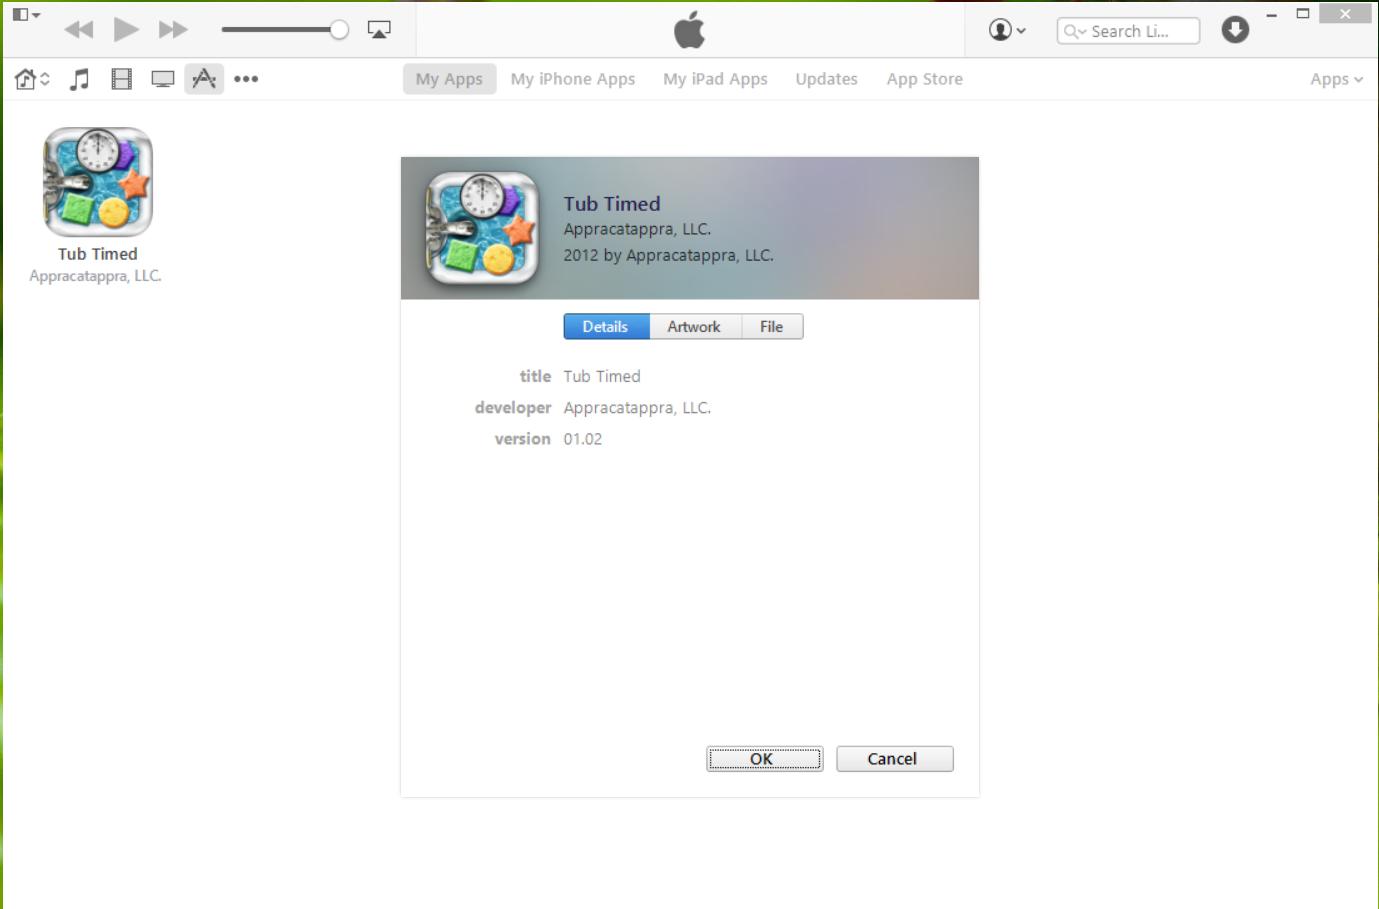 Install Cracked IPA Apps on iPhone / iPad using iFunbox